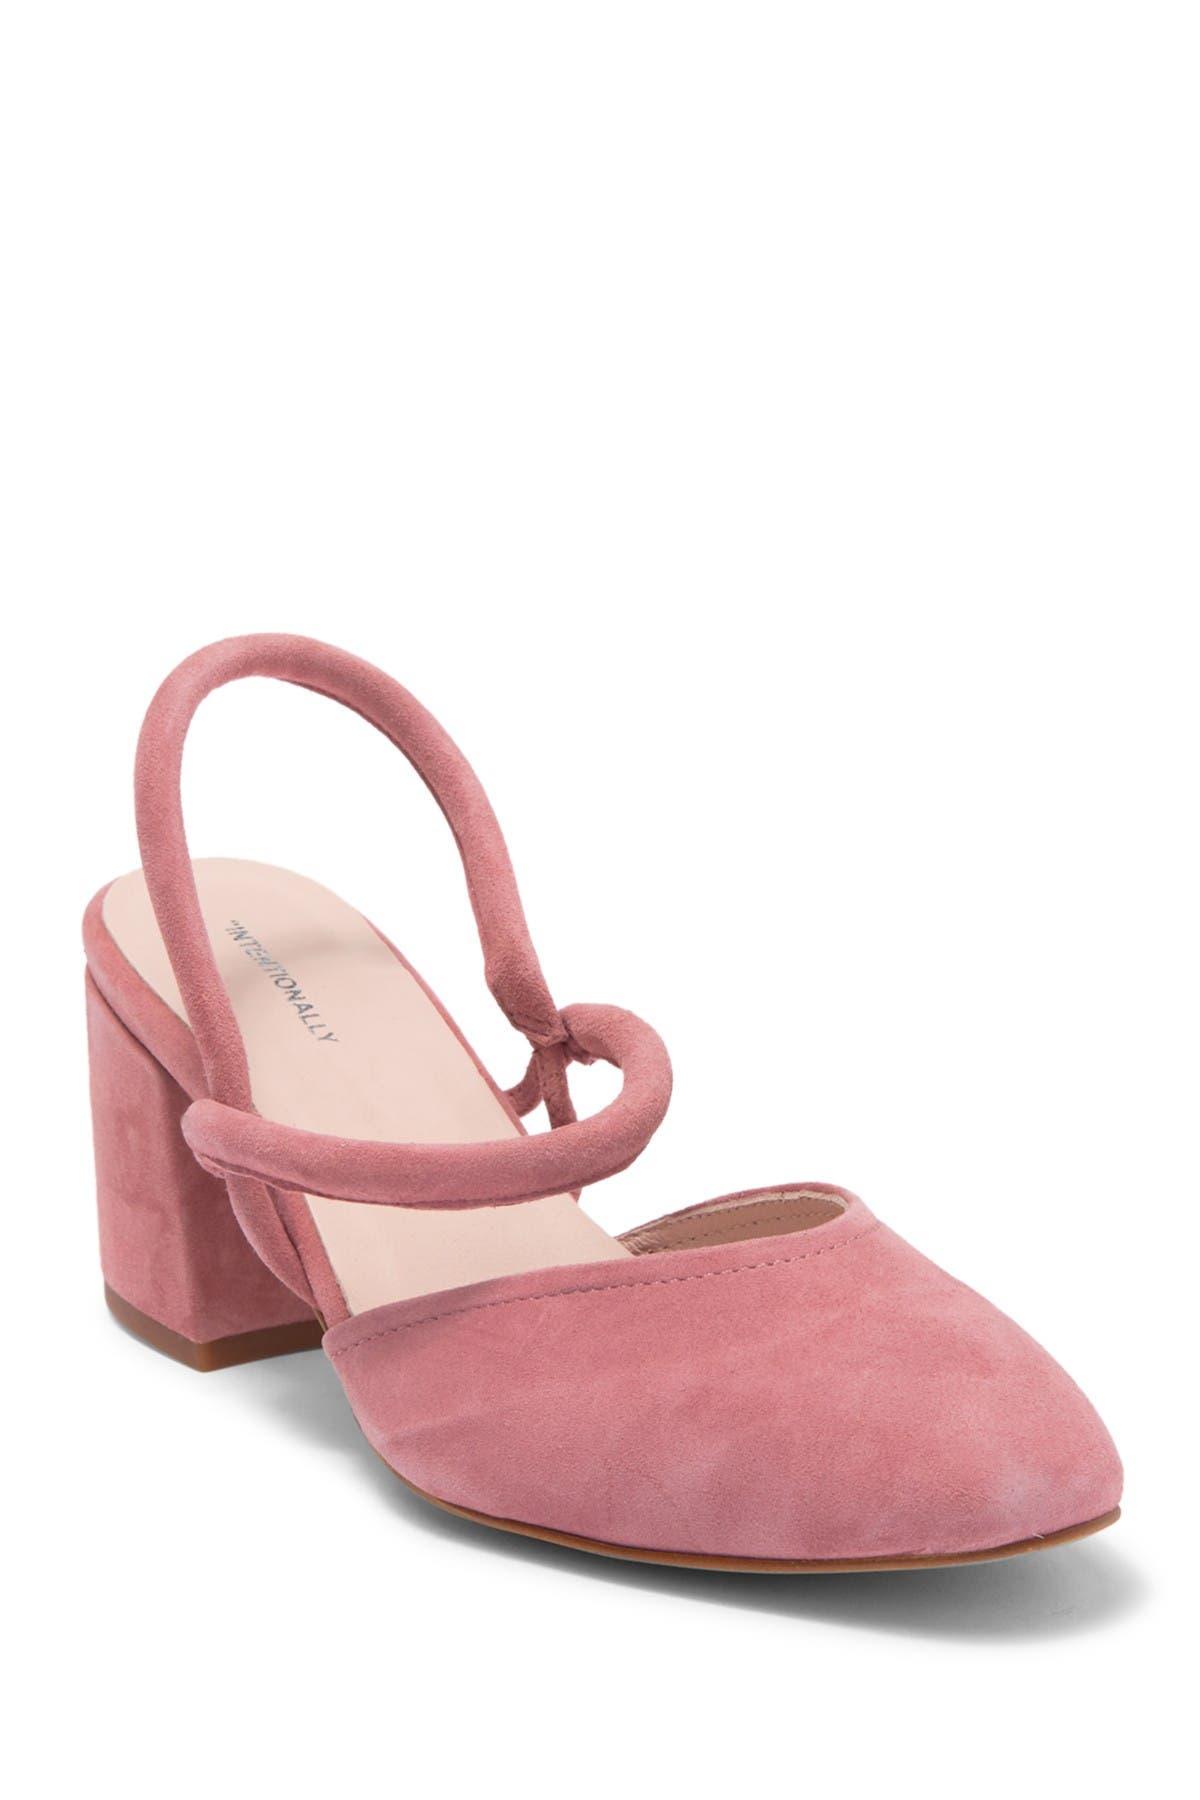 Image of Intentionally Blank Freckle Rose Suede Block Heel Pump